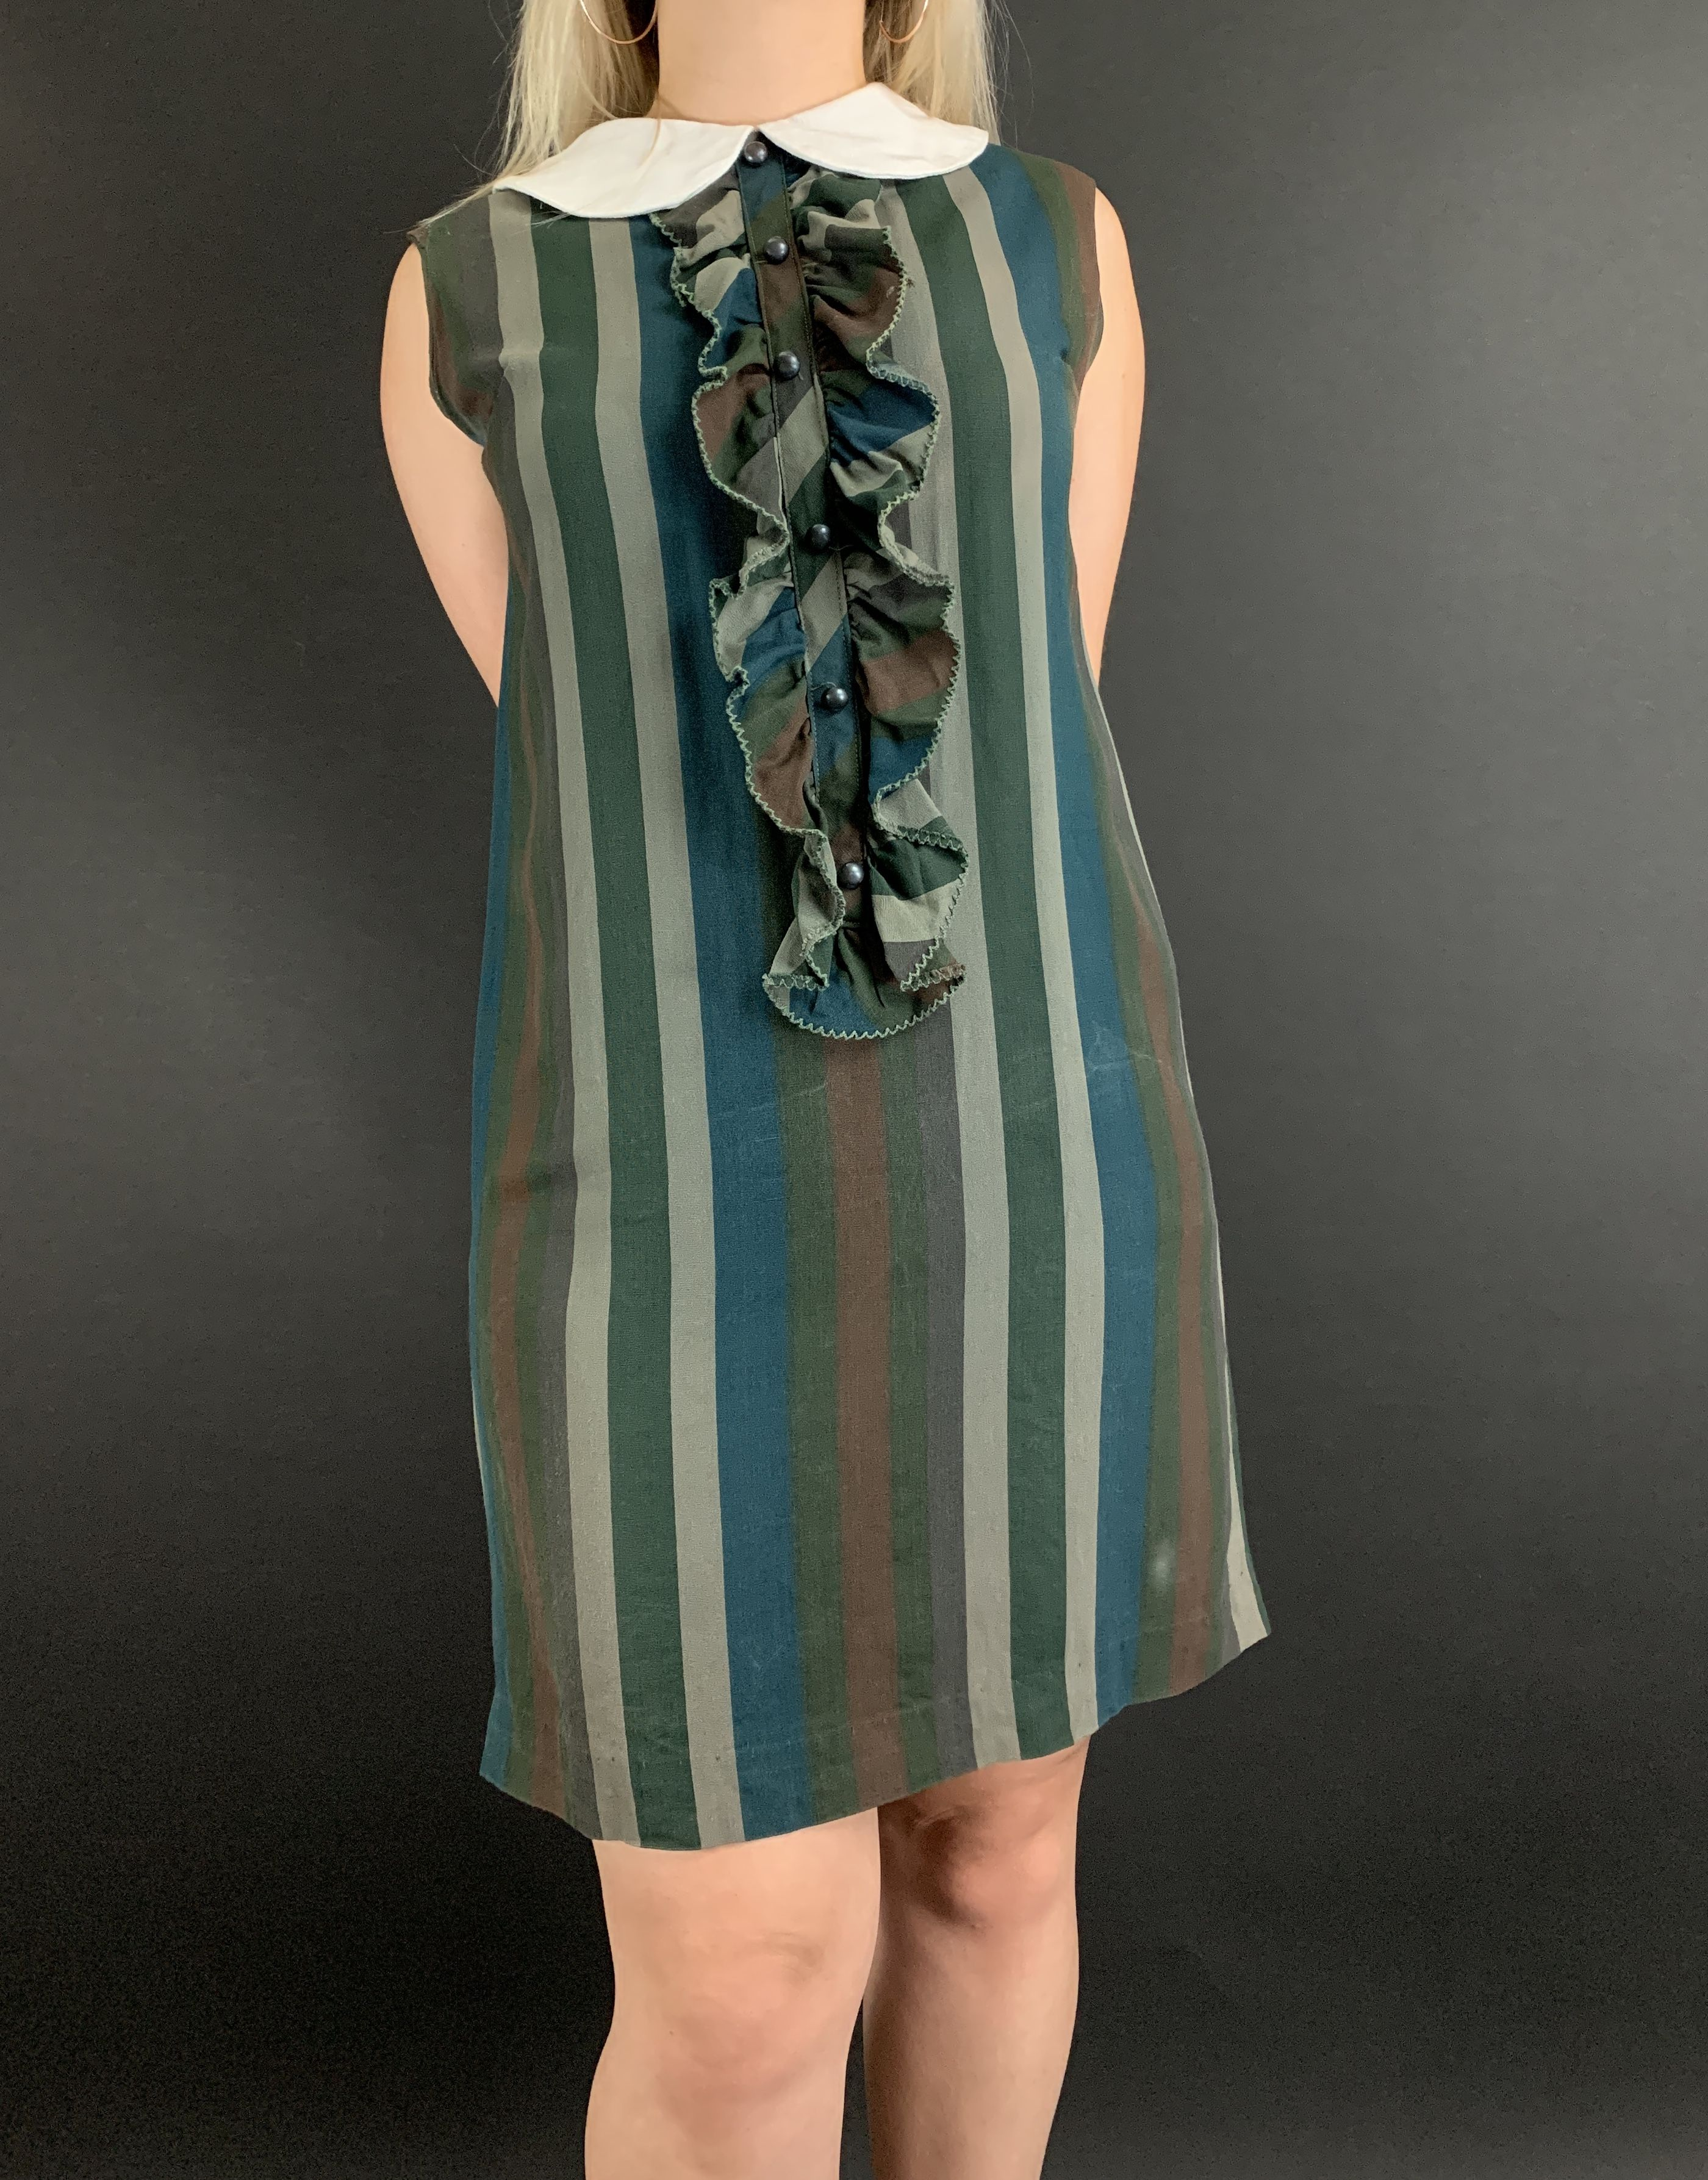 60s 70s Ruffled Peter Pan Collar Shift Dress Wildfirevintage Shift Dress Striped Shift Dress Dresses [ 3574 x 2800 Pixel ]